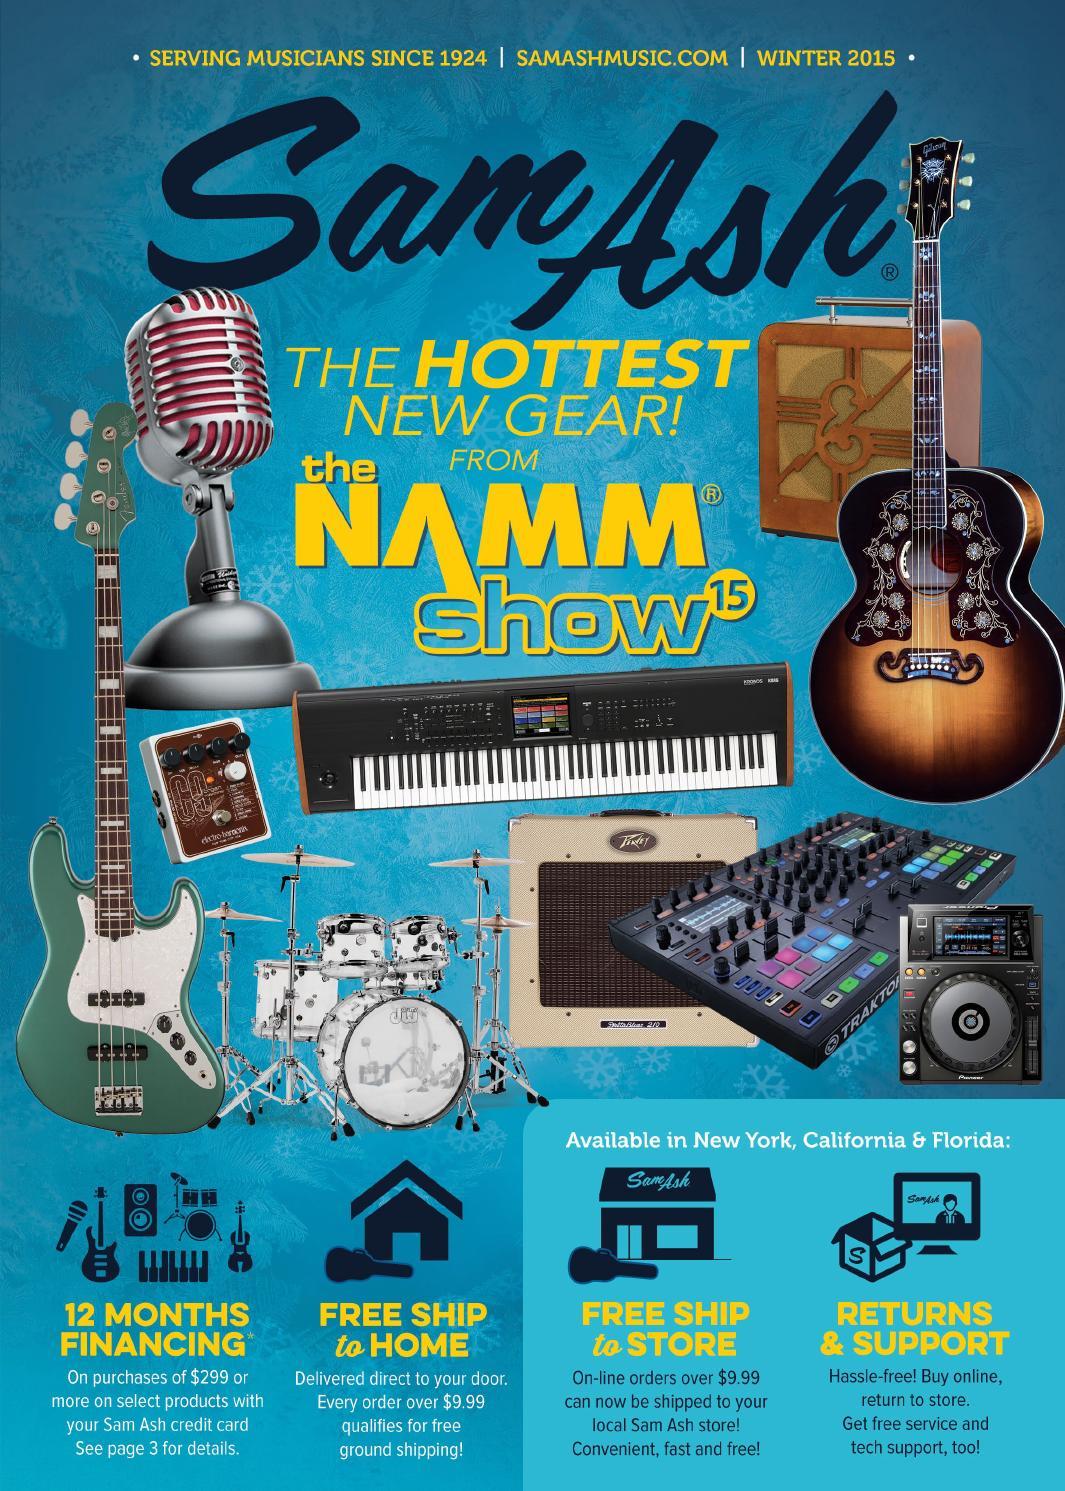 Sam Ash Winter 2015 Gear Guide by Sam Ash Music Corp. - issuu